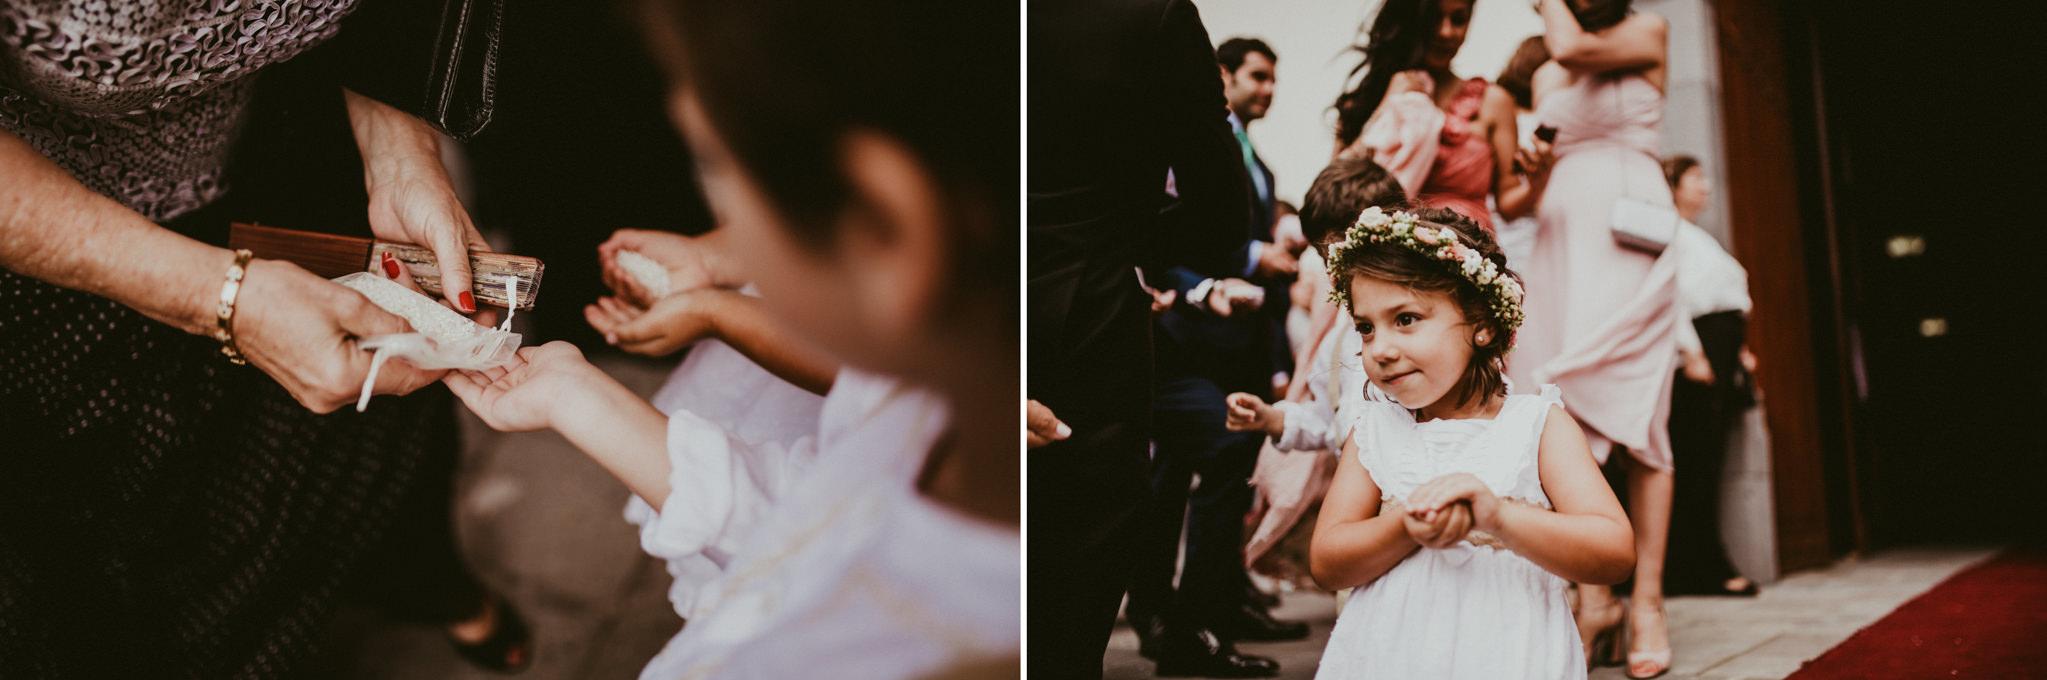 Jessica+Oscar-wedding-122